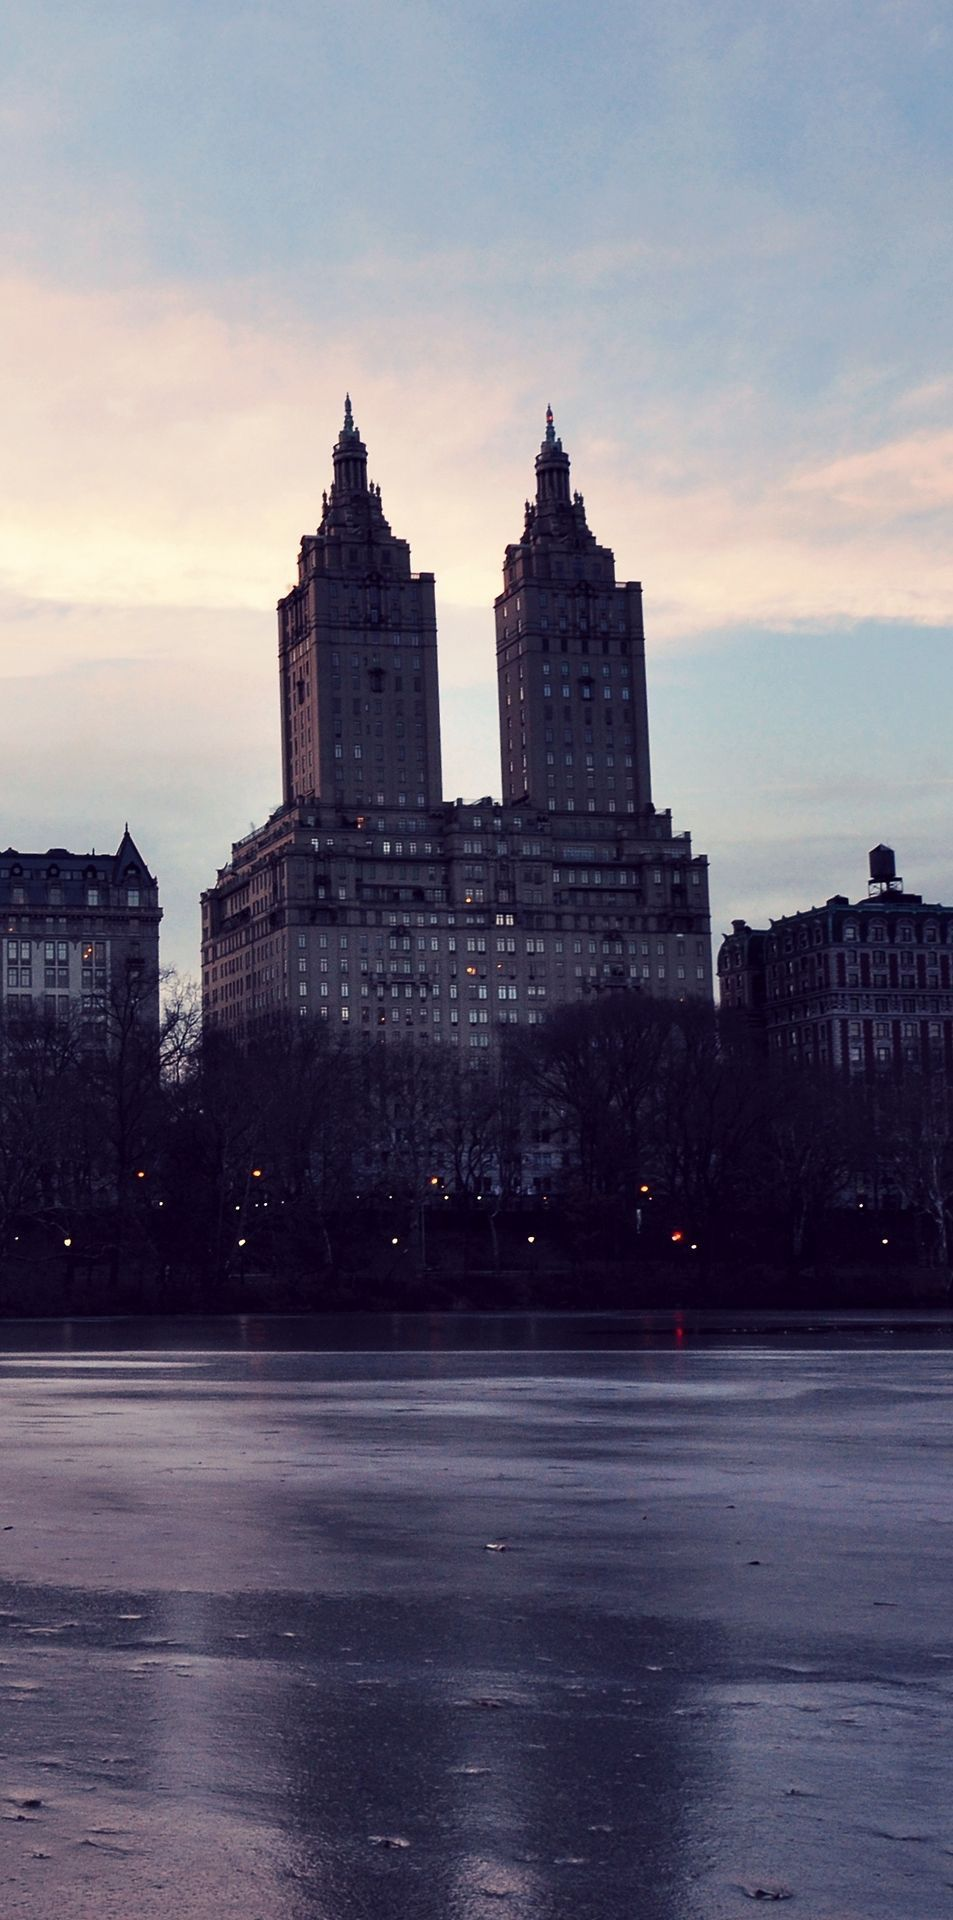 Pin by Rachel Brock on New York Holidays in new york